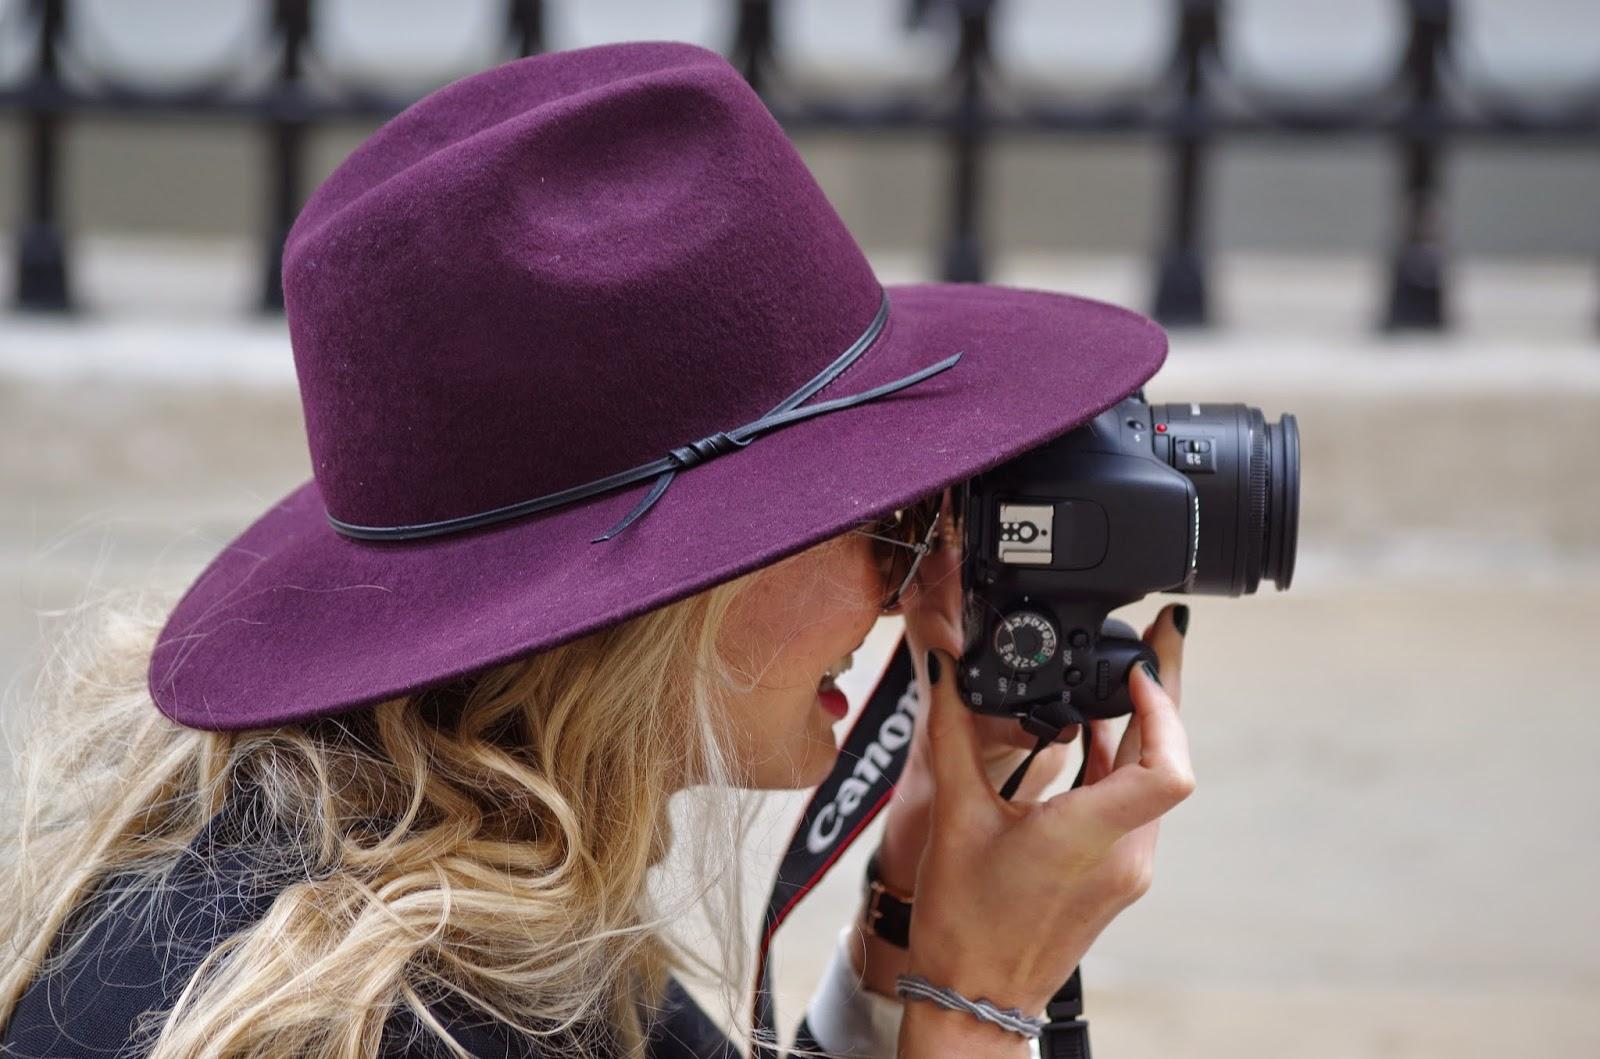 reiss mimi hat, reiss mimi burgundy hat